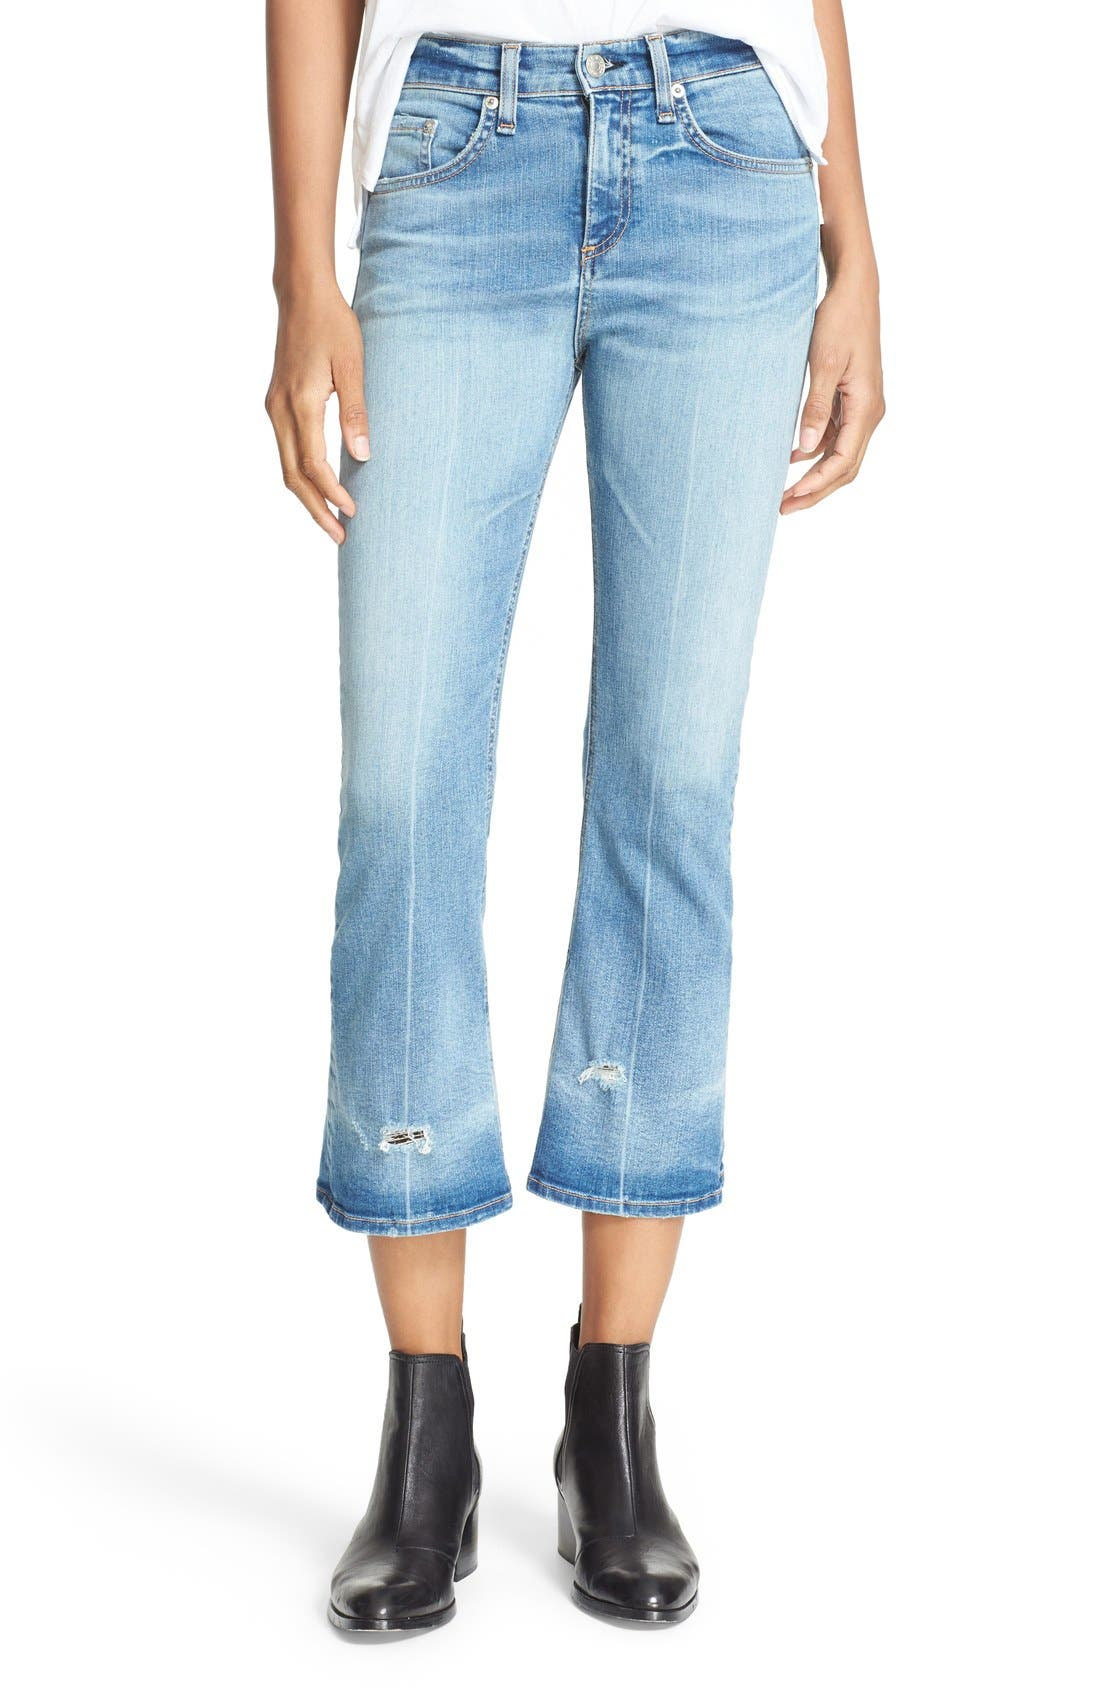 RAG & BONE JEAN Distressed Crop Flare Jeans, Main, color, 451